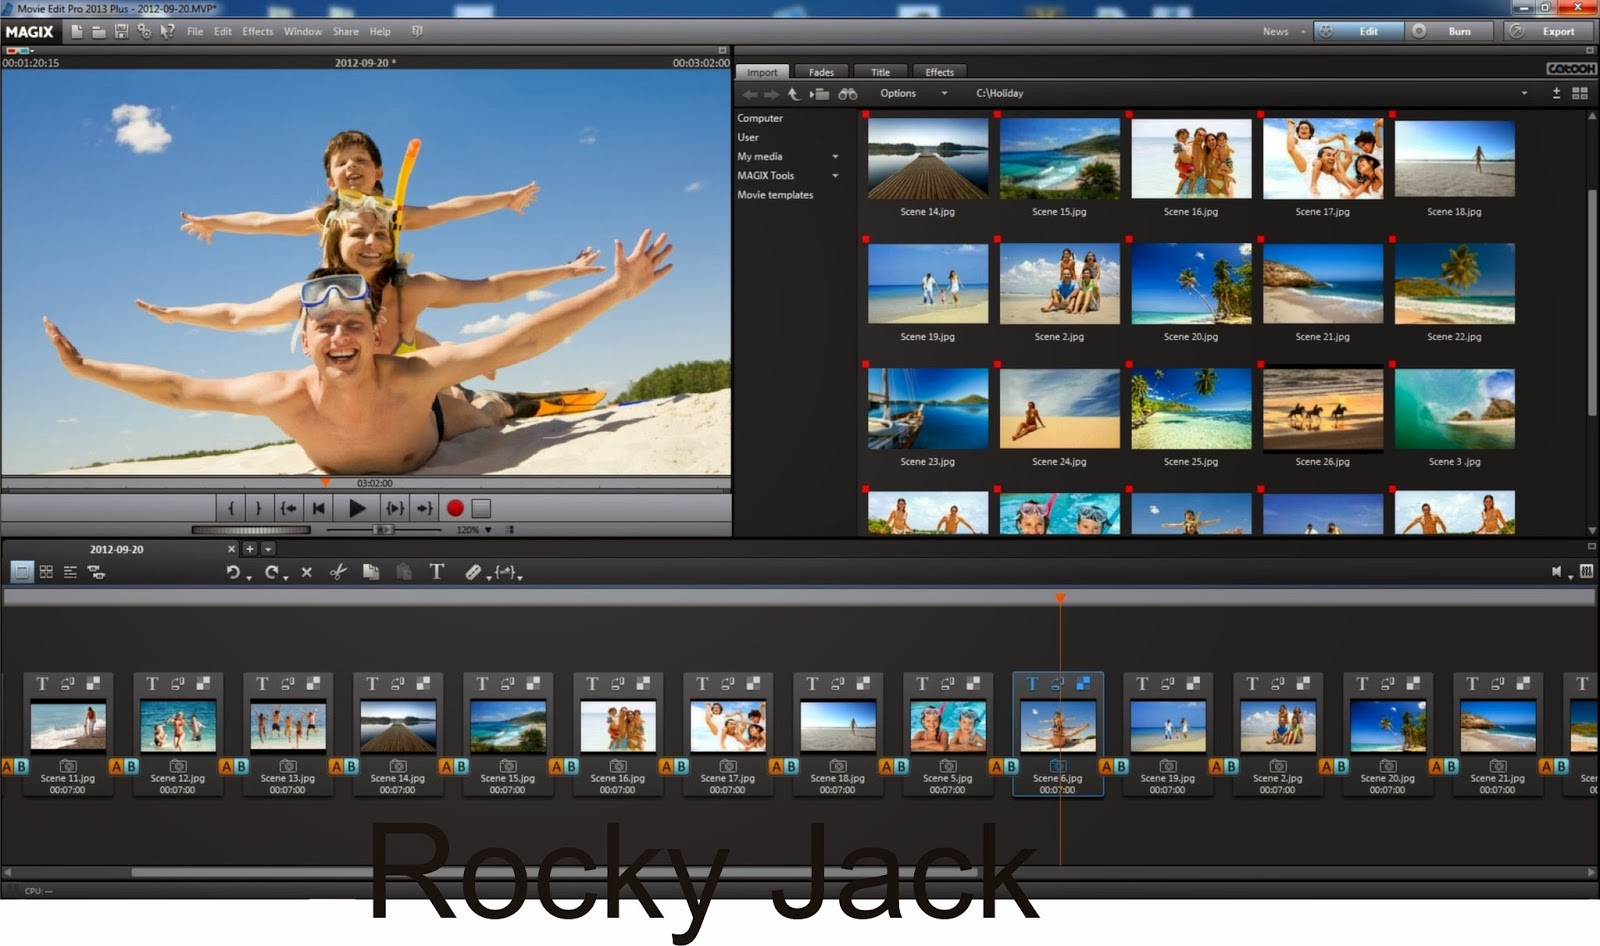 magix movie edit pro free download full version